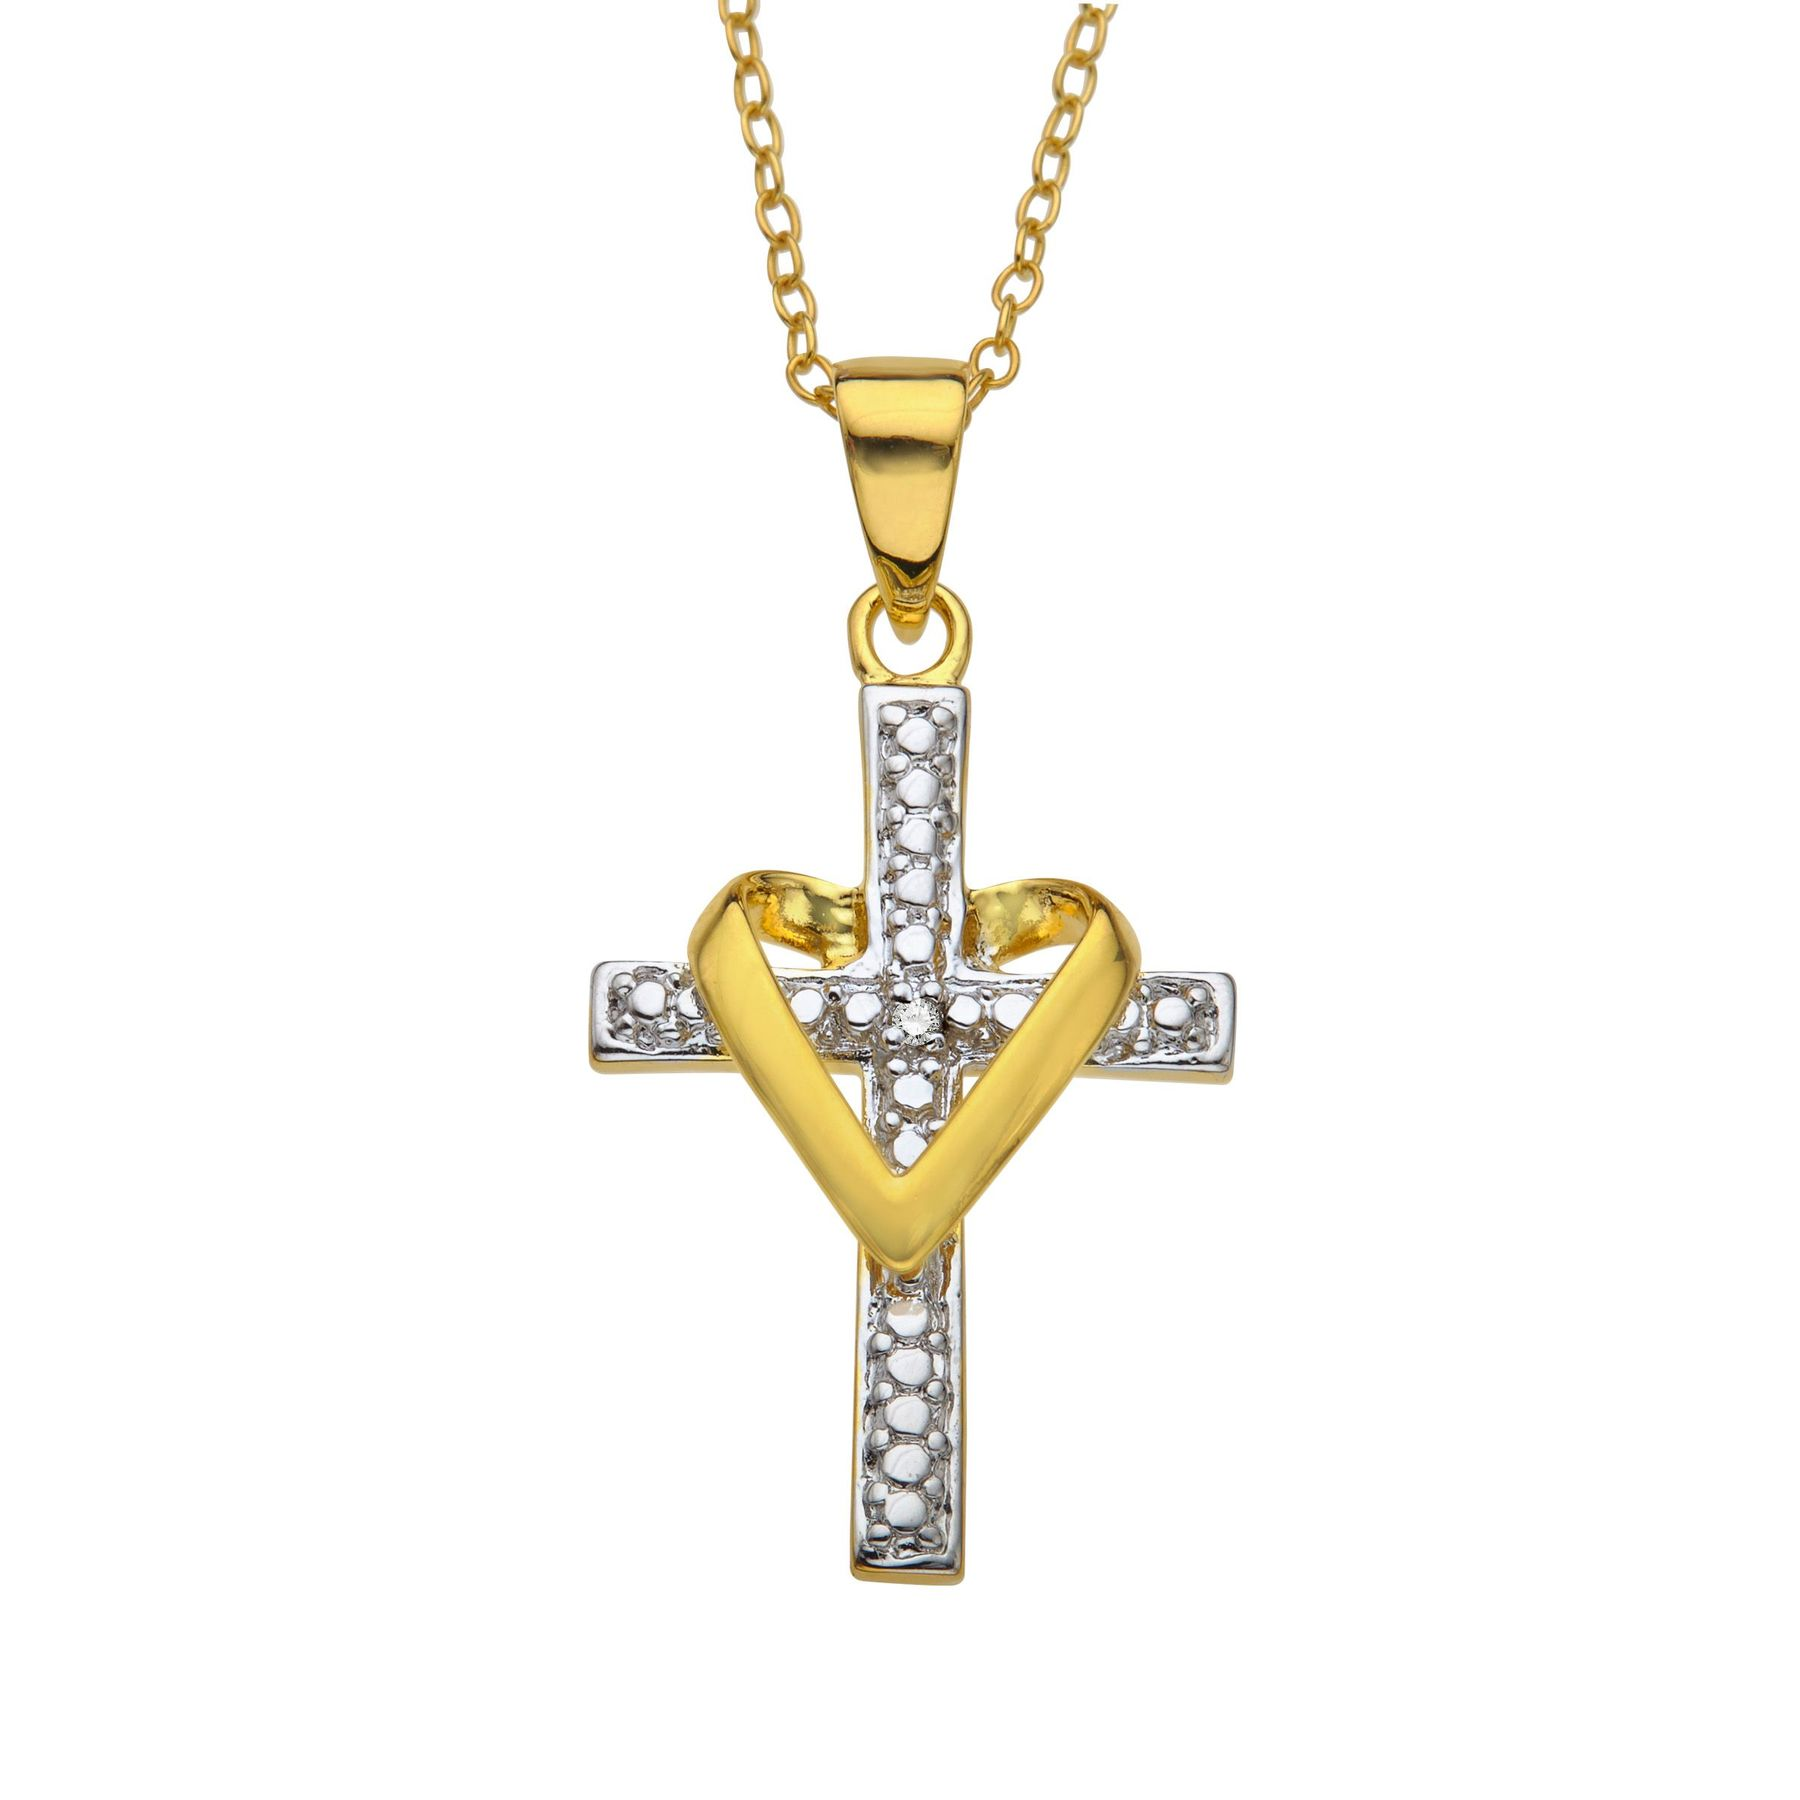 Heart cross pendant with diamond in 18k gold plated sterling silver heart cross pendant with necklace aloadofball Gallery